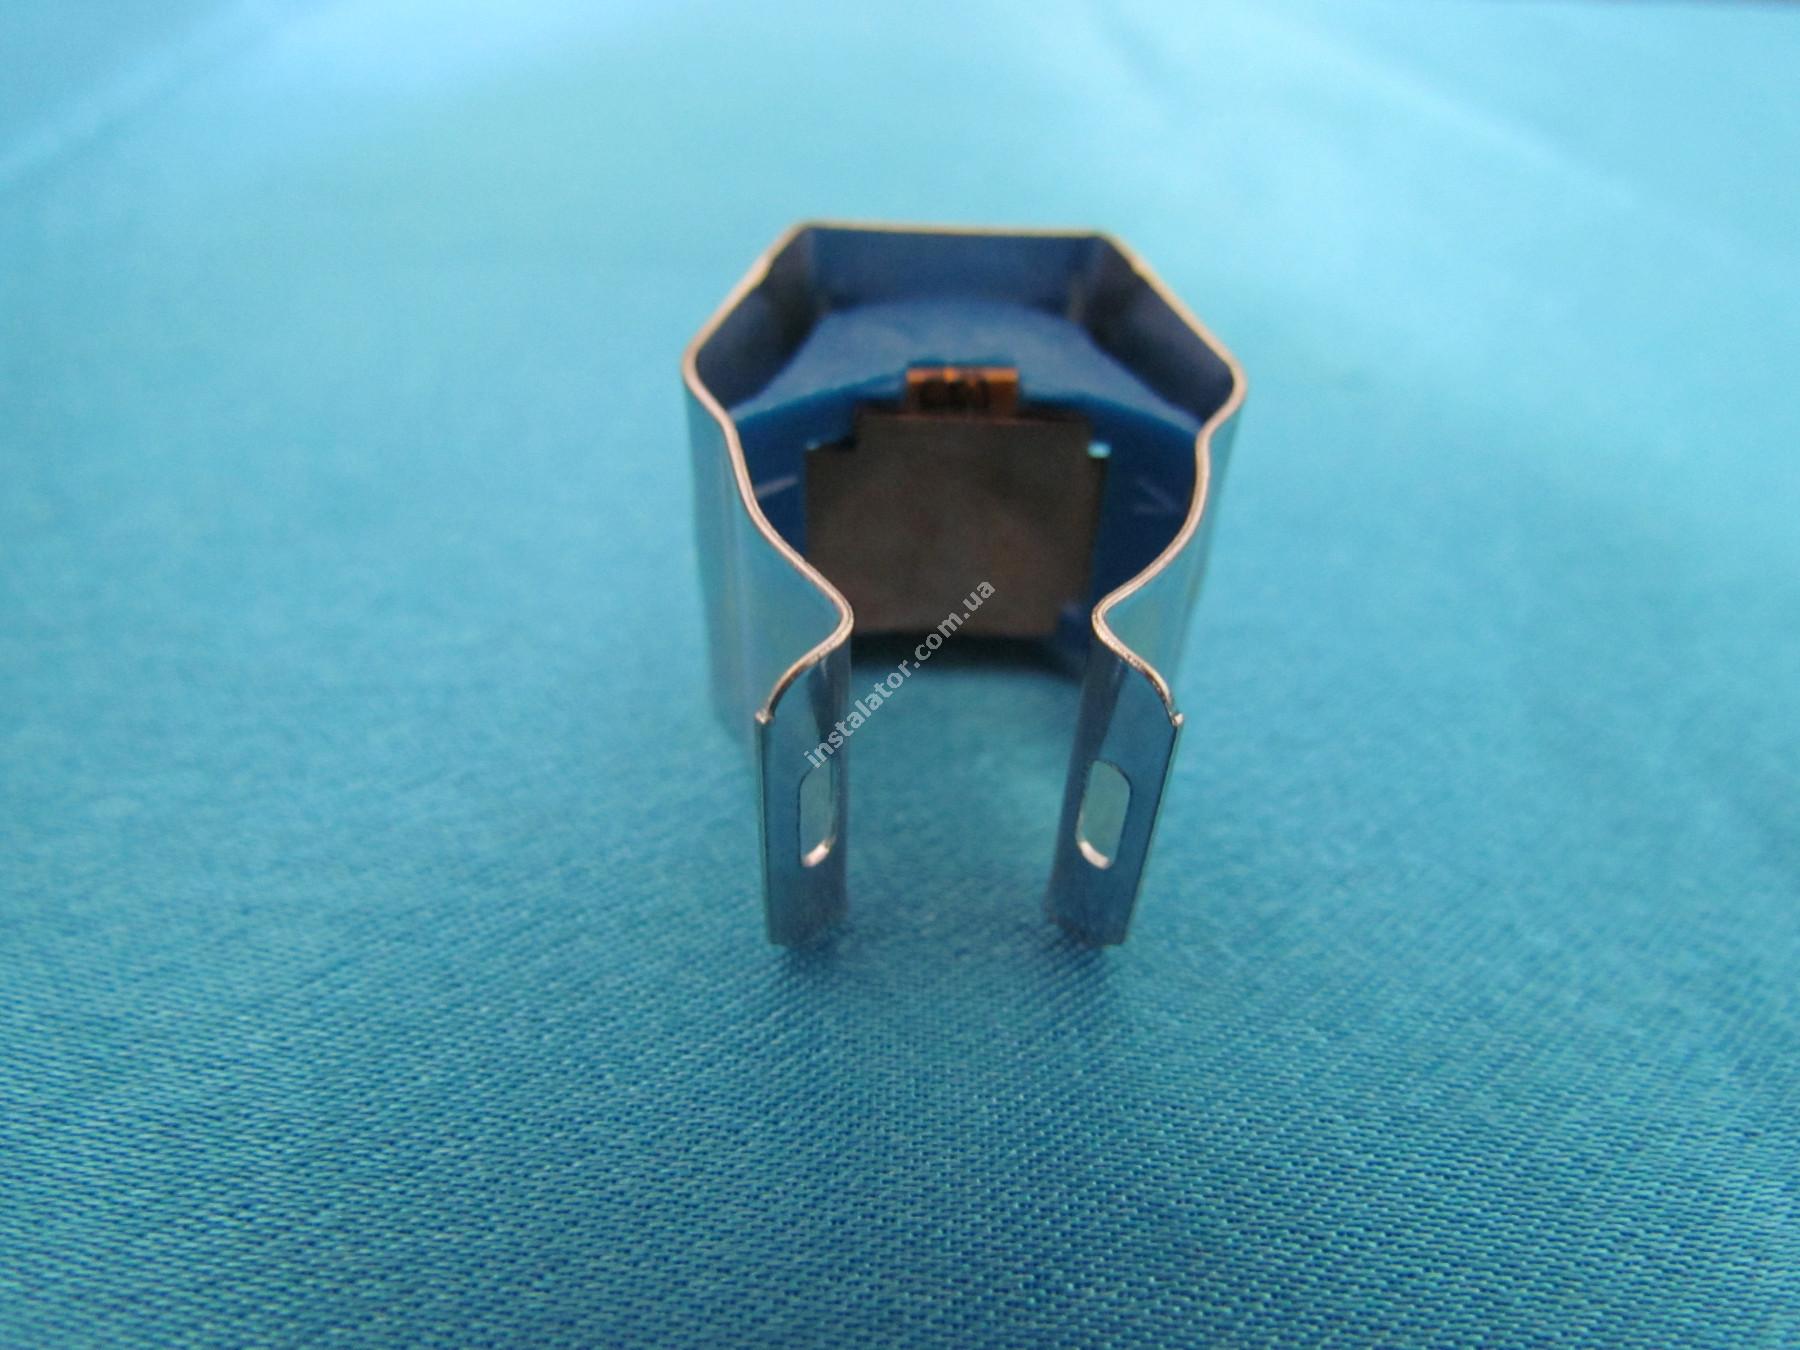 39819550 Датчик температури NTC (термостат) Ferroli DOMIproject, DOMItech,DIVATOP full-image-3